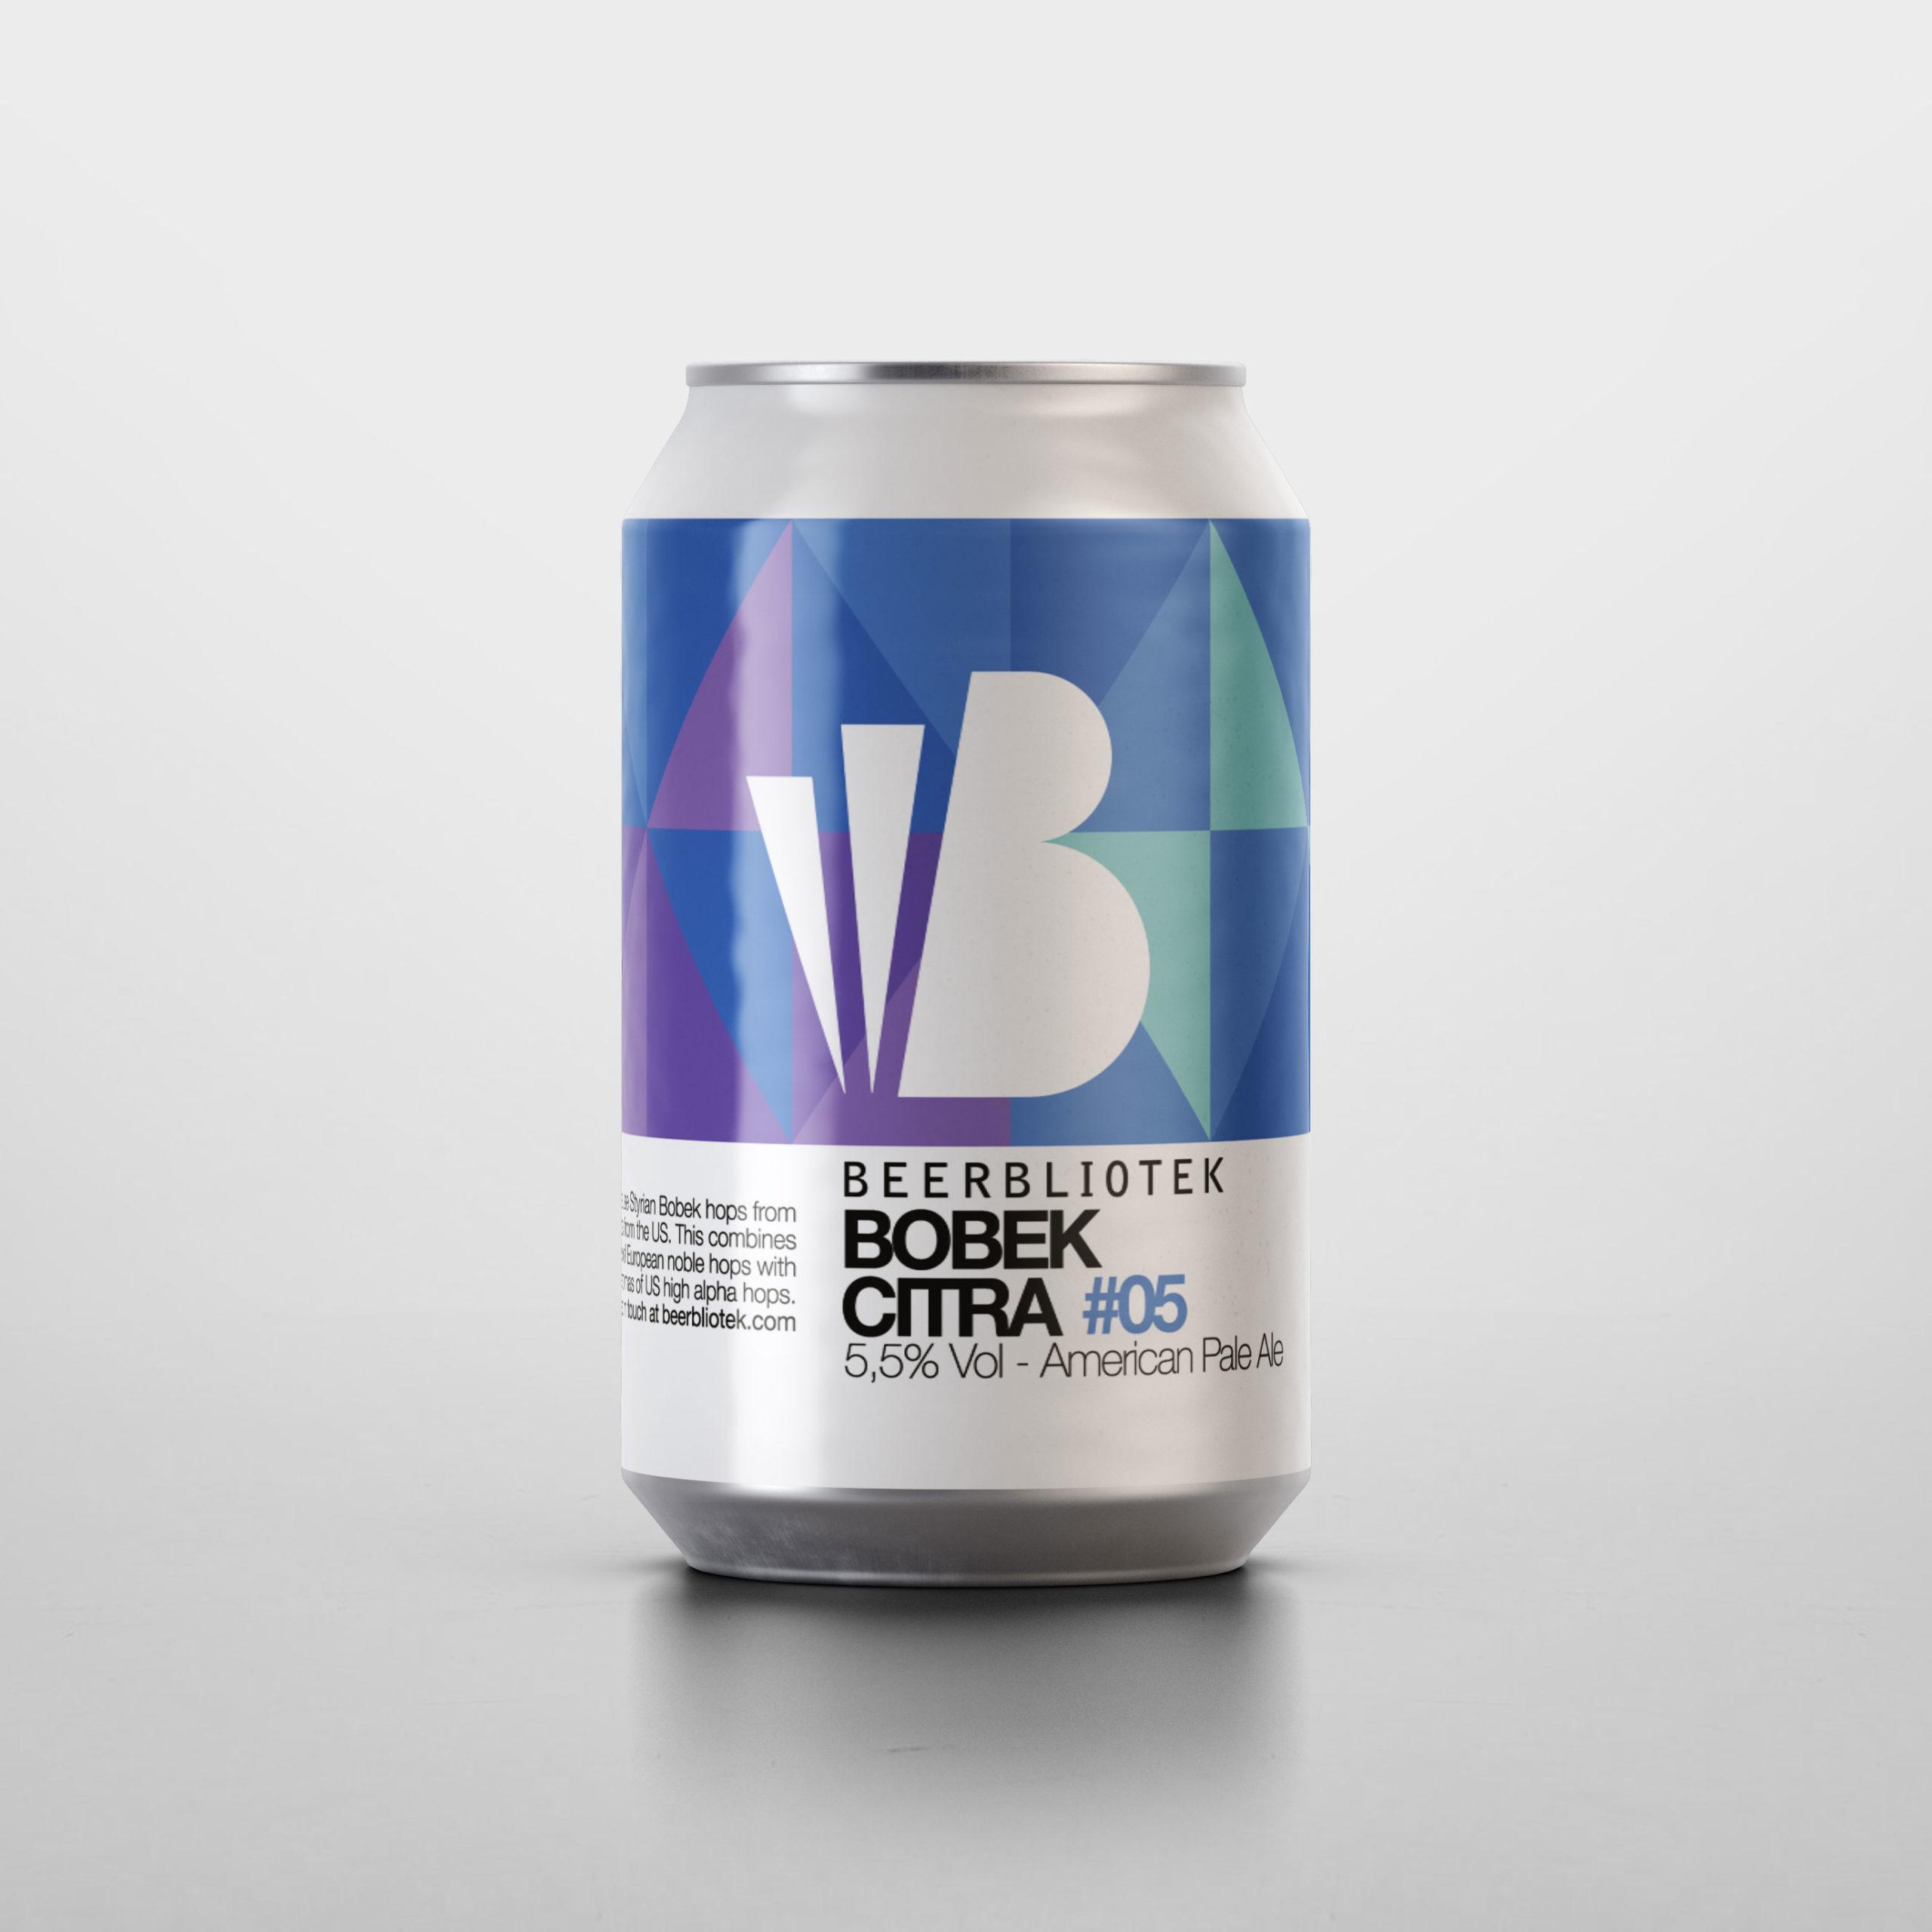 A can packshot of Bobek Citra, an American Pale Ale, brewed by Swedish Craft Brewery Beerbliotek.